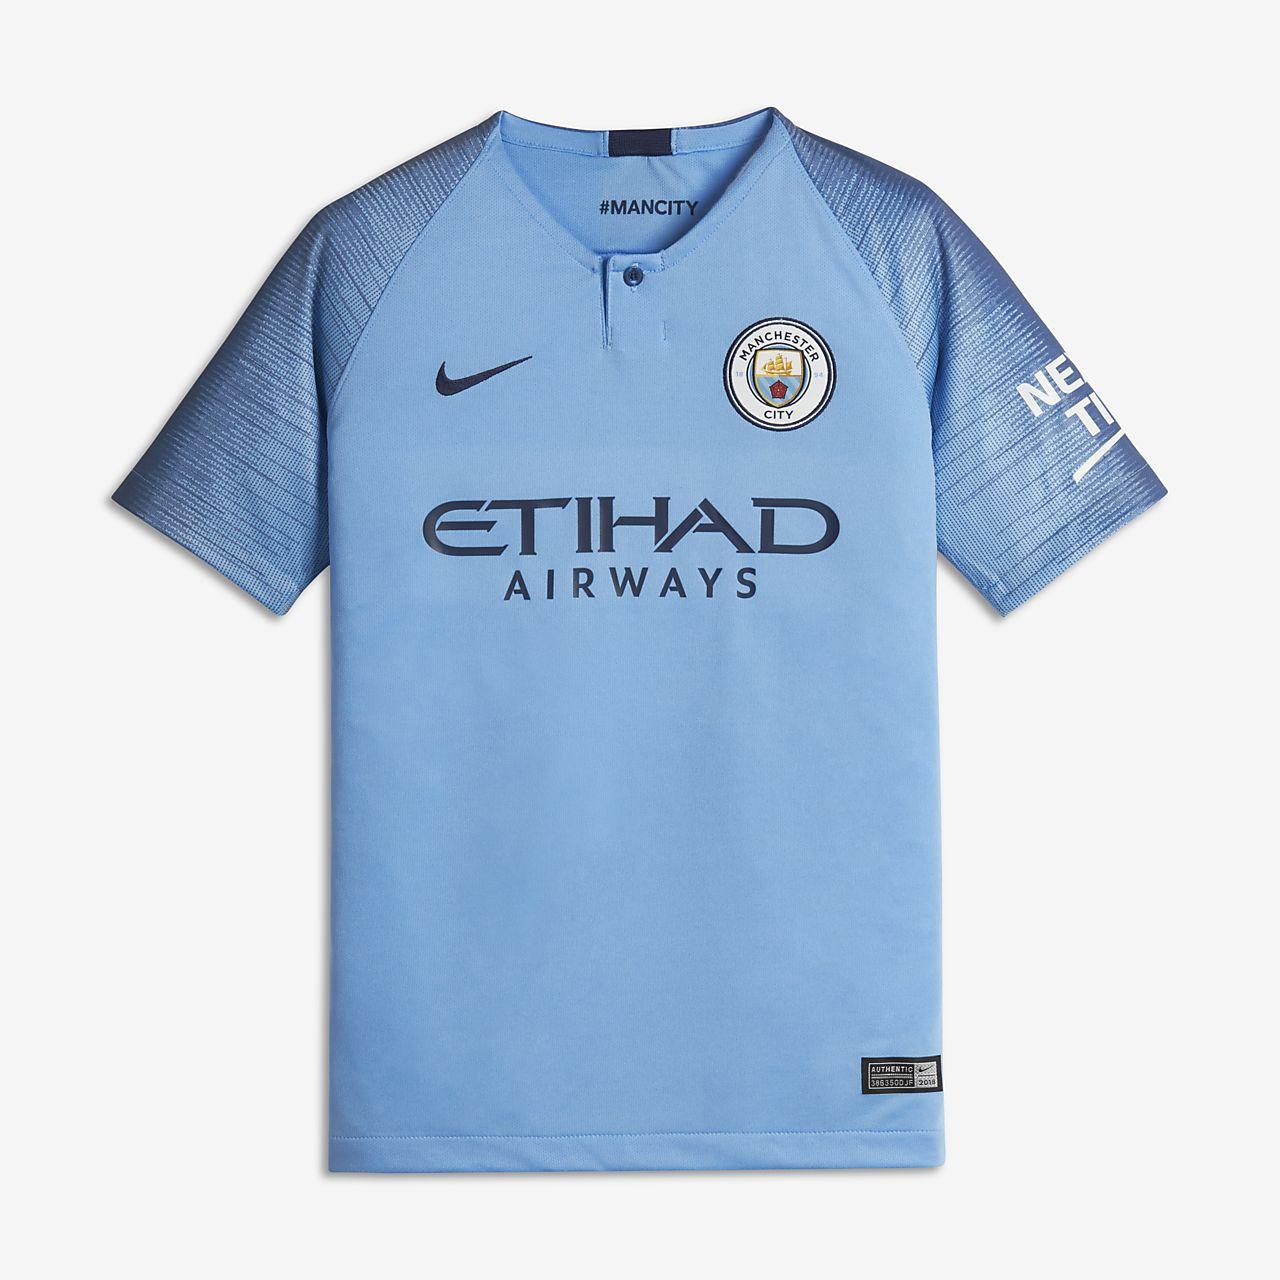 2018/19 Manchester City Stadium Home Fußballtrikot für ältere Kinder